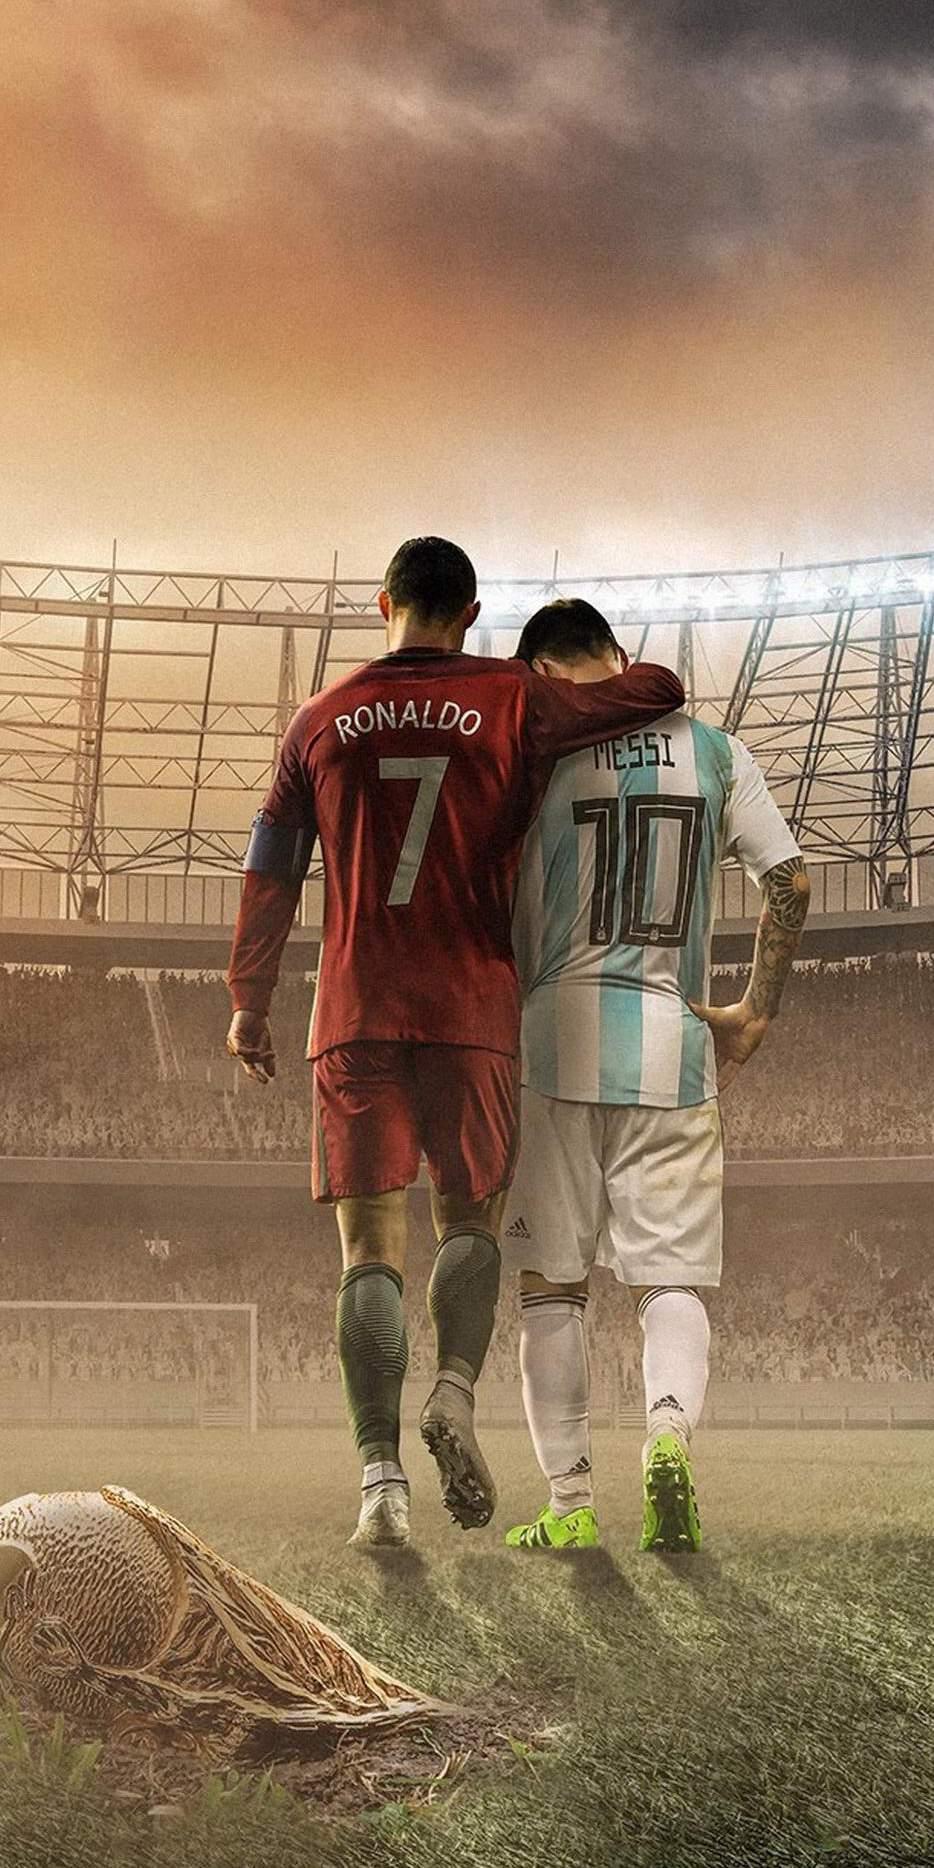 Messi And Ronaldo Football Iphone Wallpaper Iphone